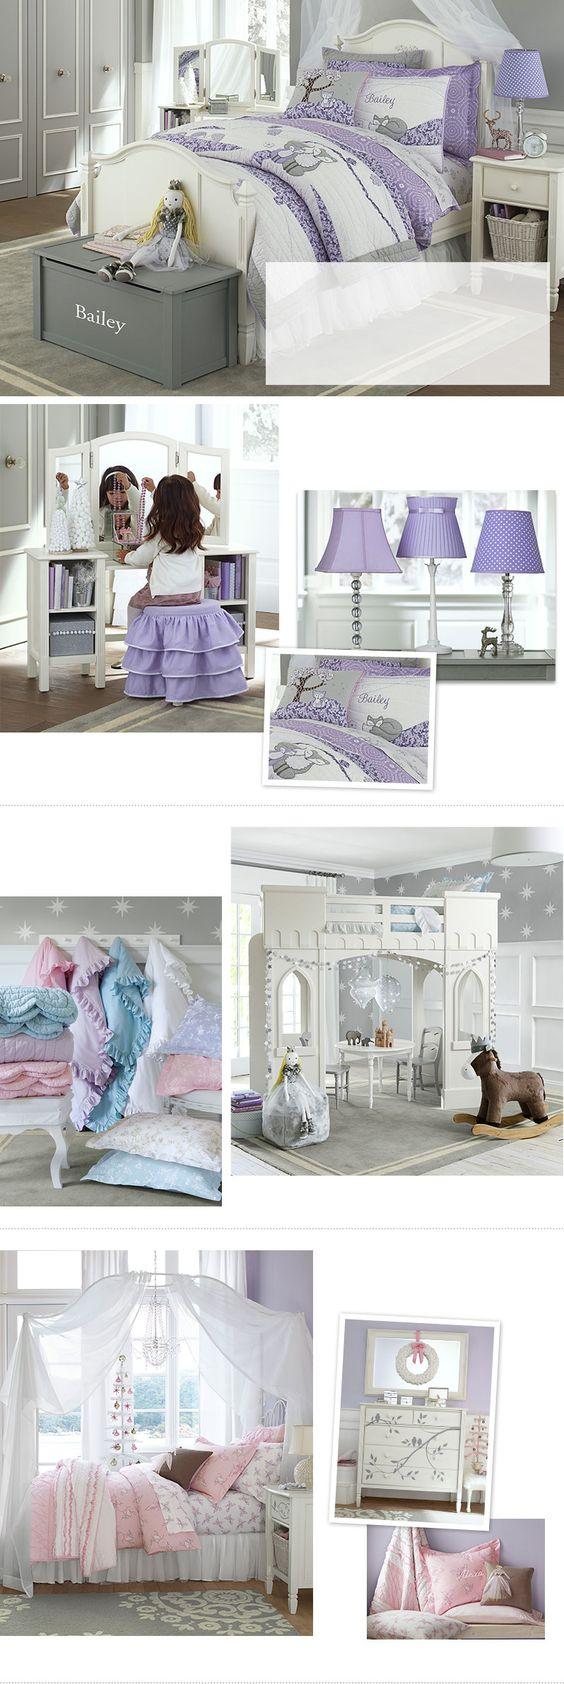 Girls Bedroom Ideas & Girls Room Ideas | Pottery Barn Kids: